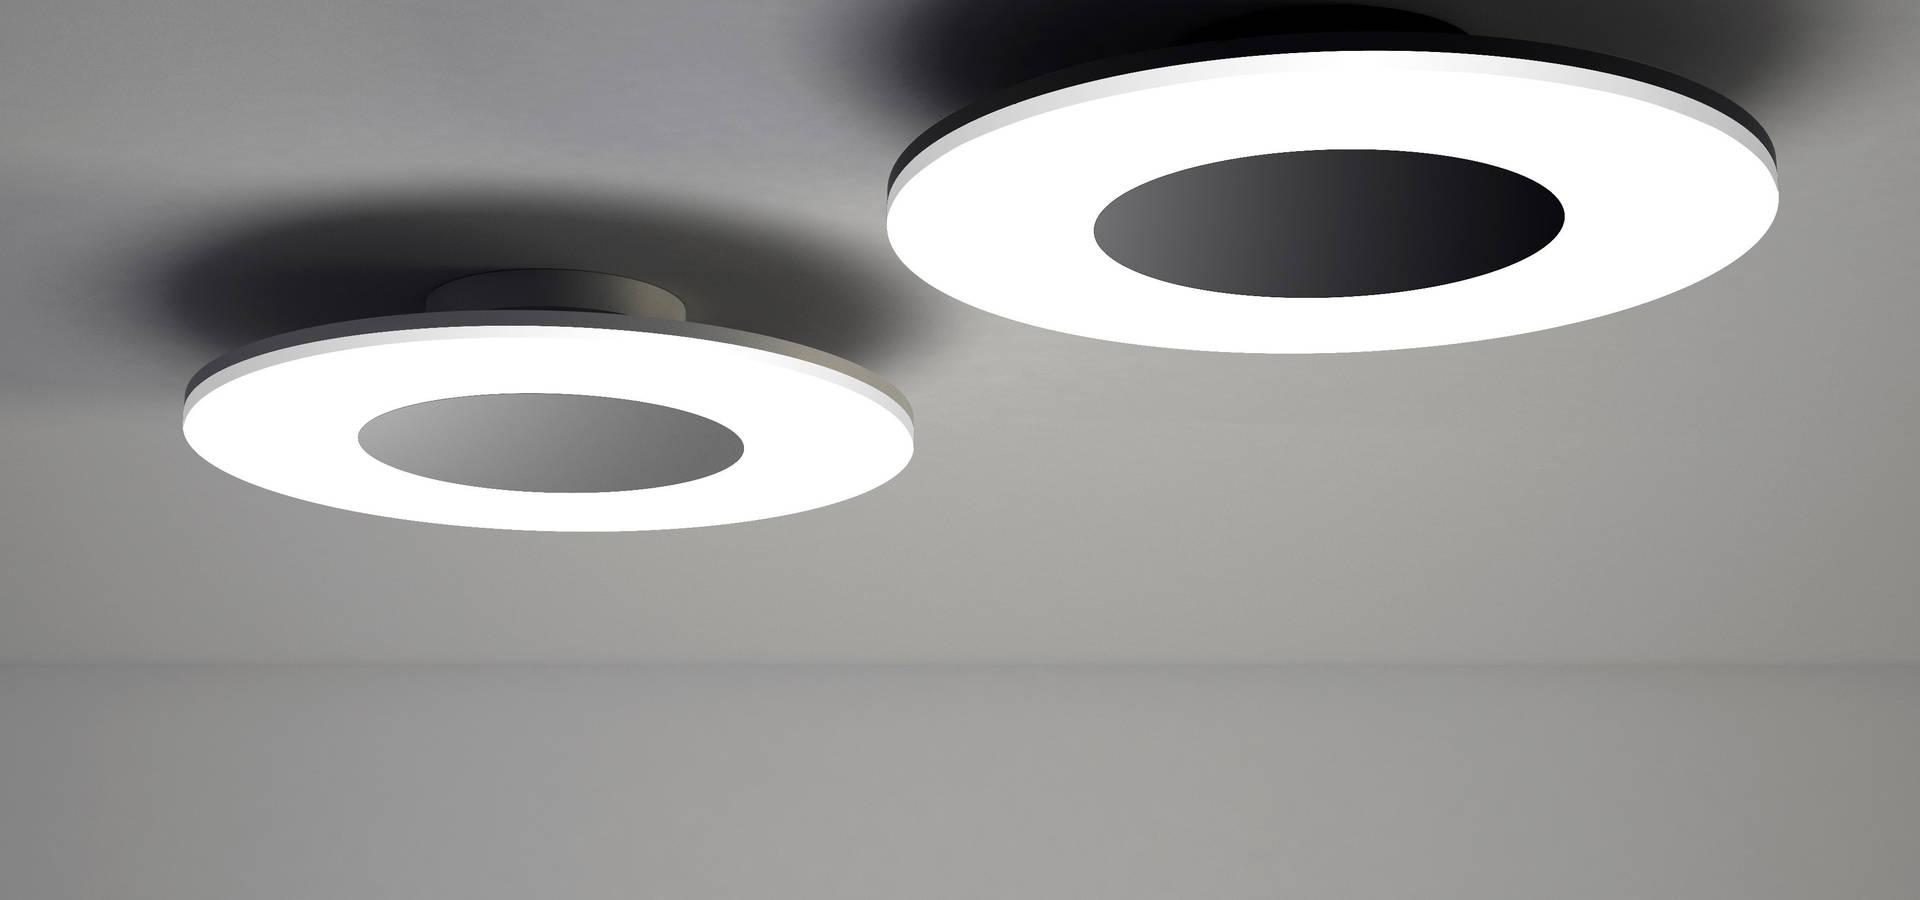 Collection design discobolo suspension plafonnier led - Lamparas led salon ...